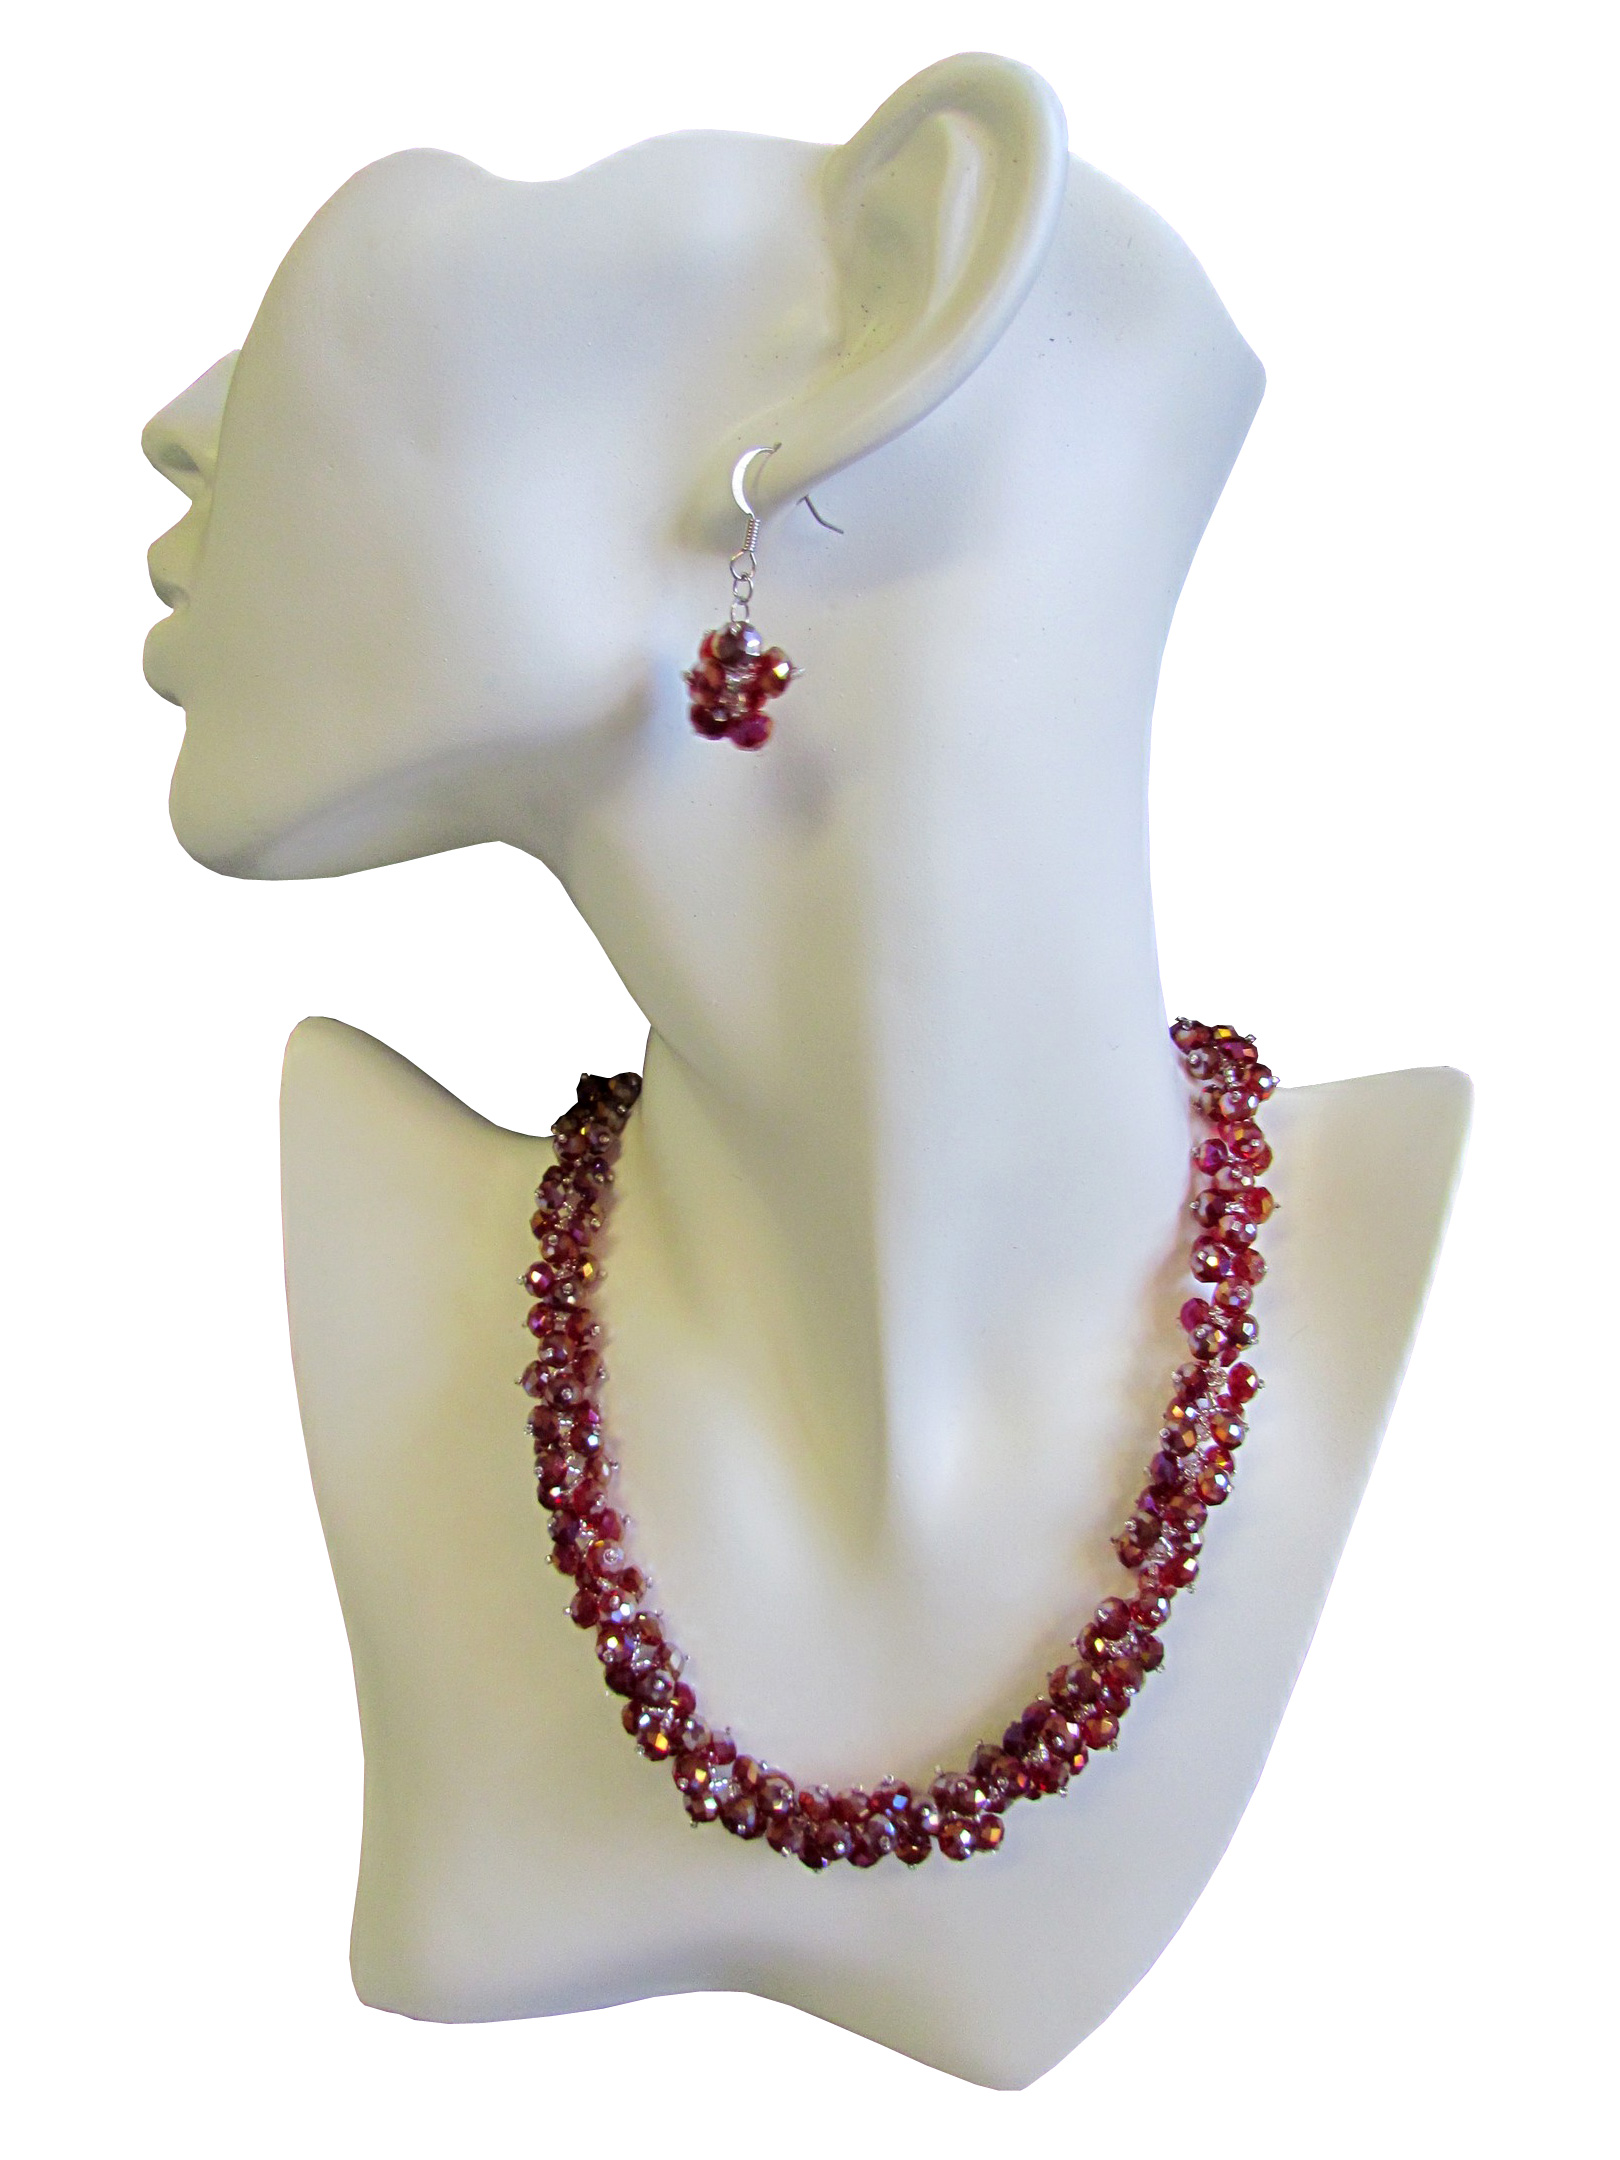 Crystal Necklace Nacre Designs